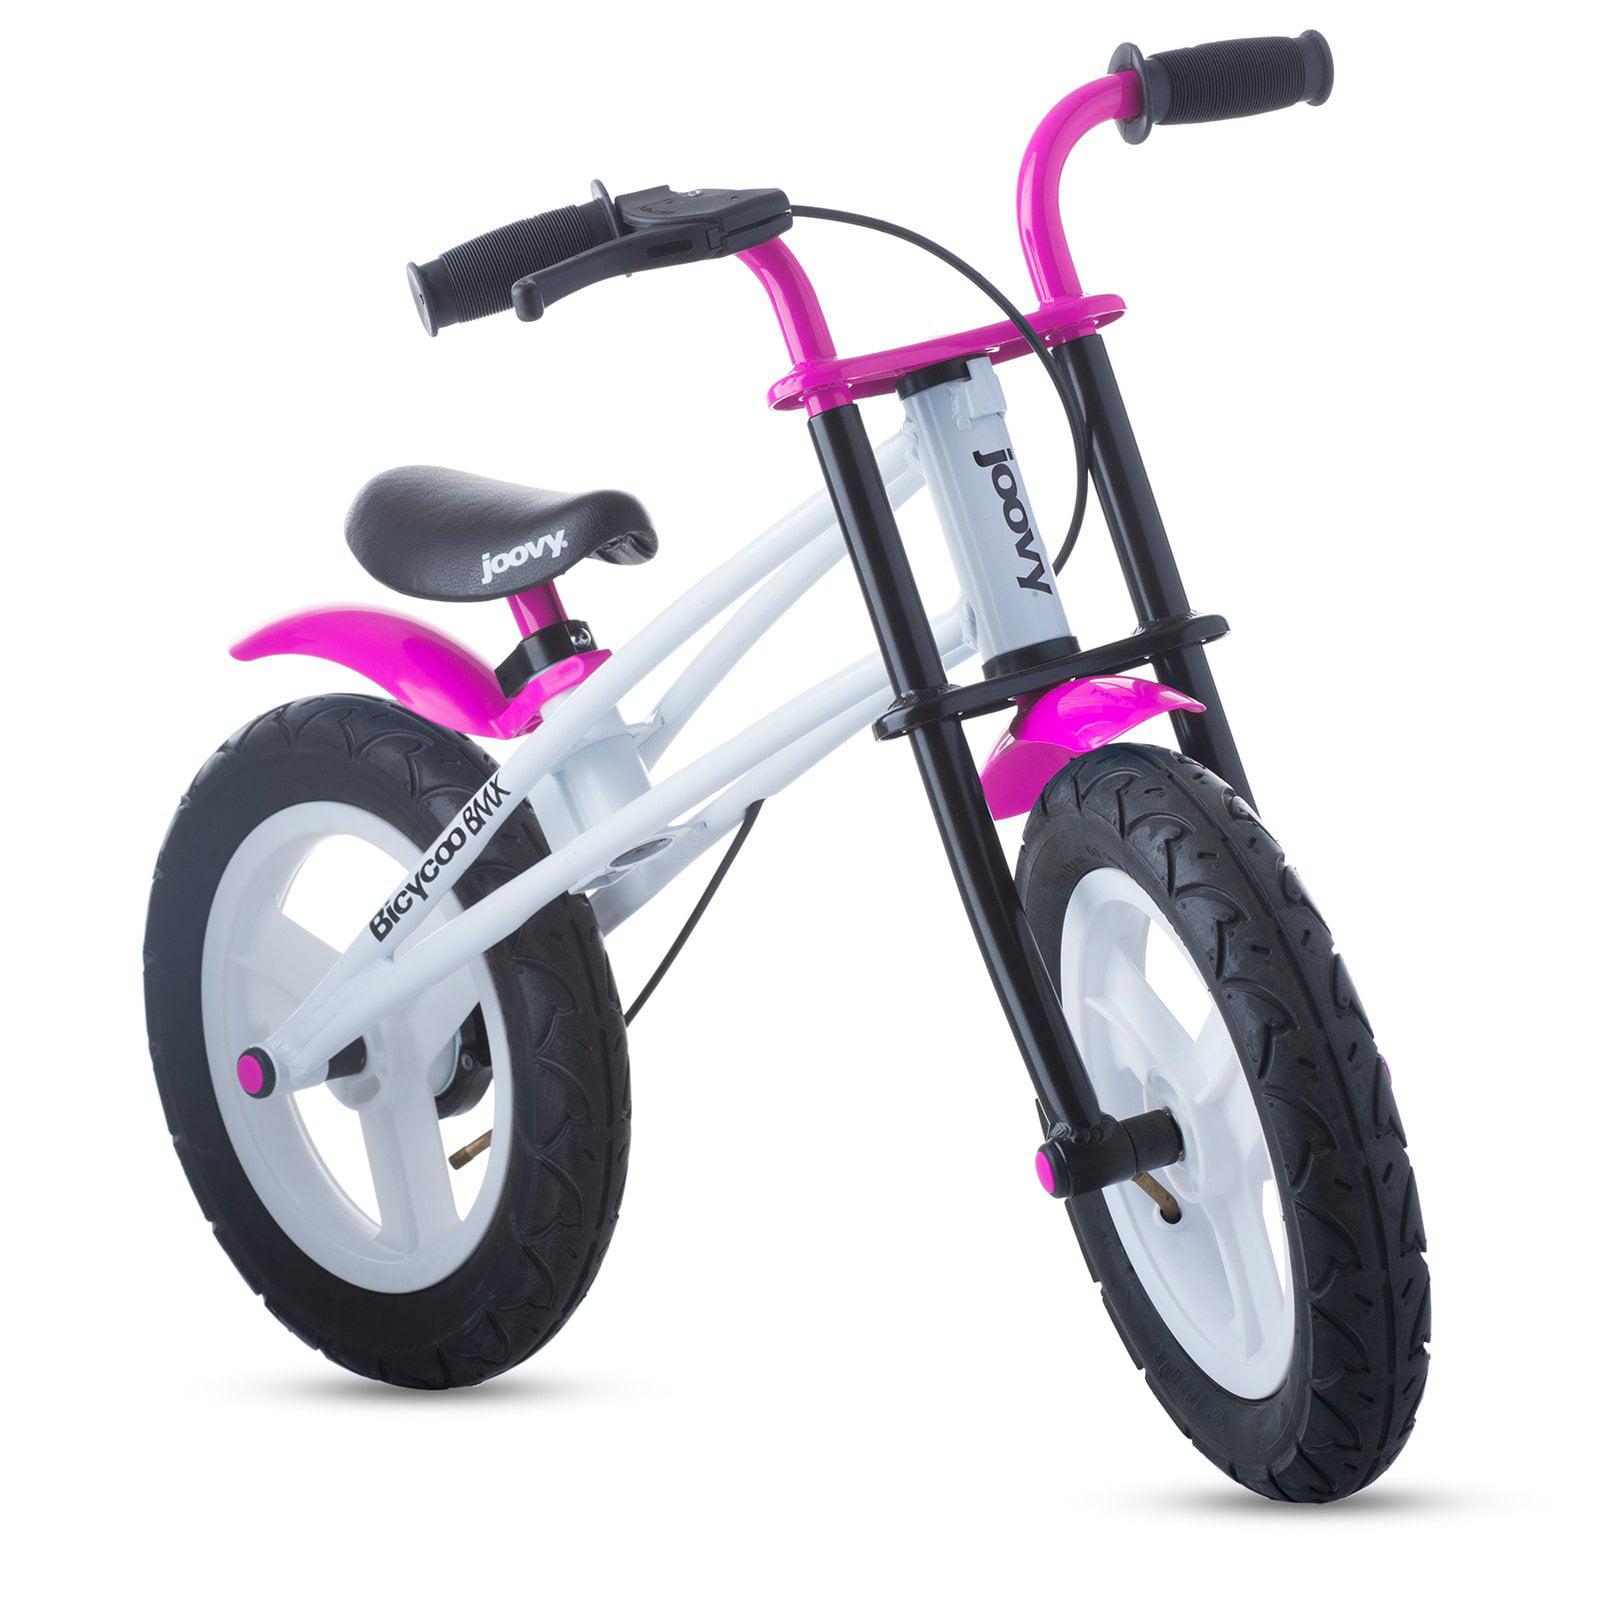 Joovy Bicycoo BMX Balance Bike Pink by Joovy